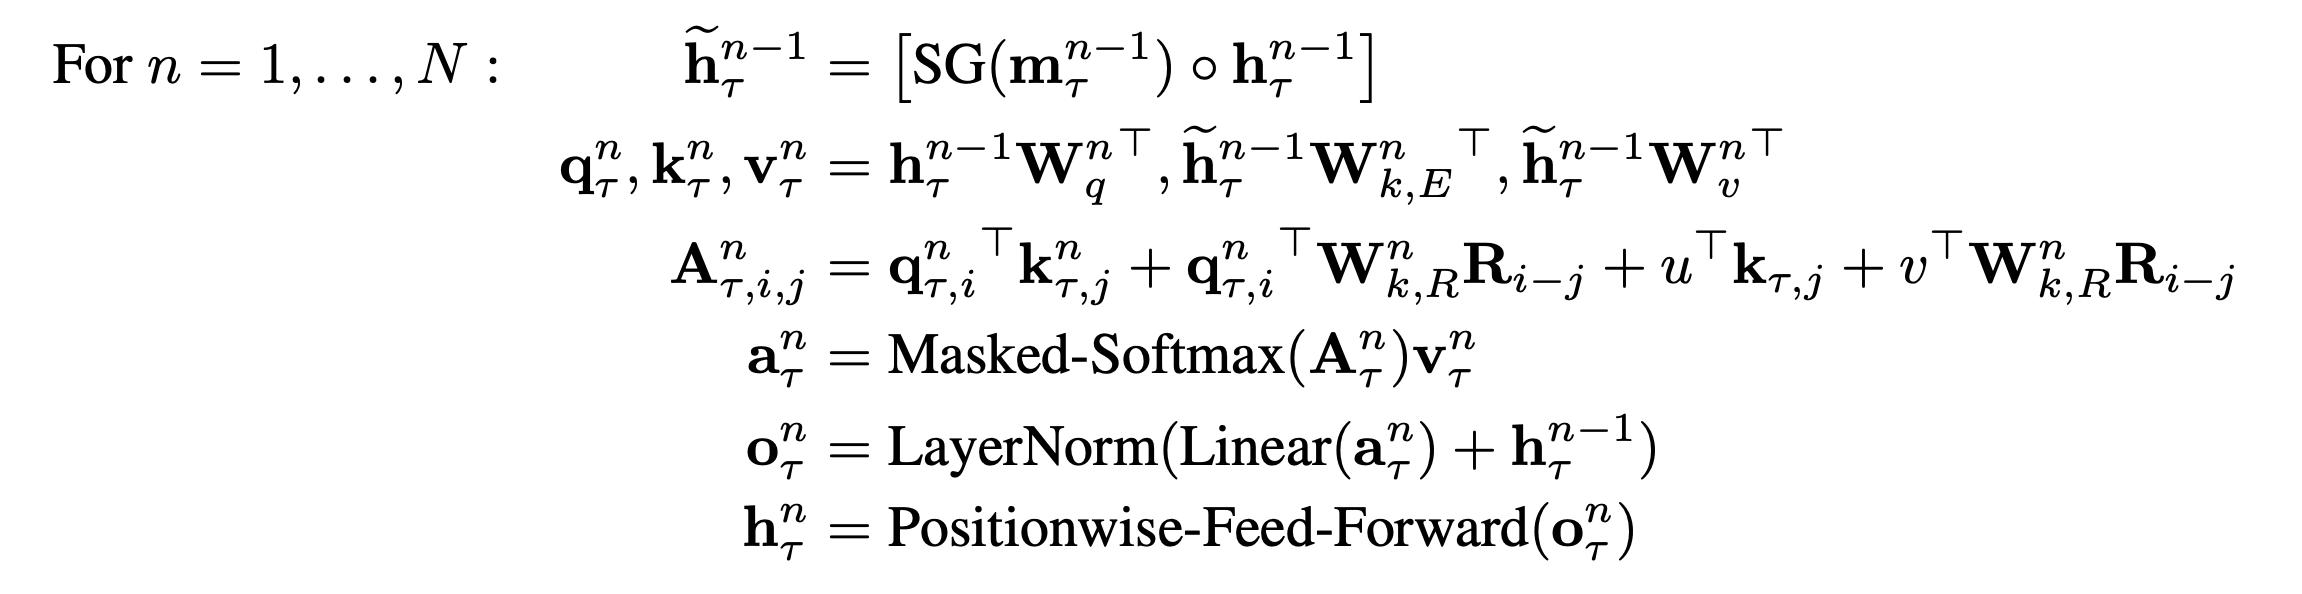 Transformer-XL的整体计算公式